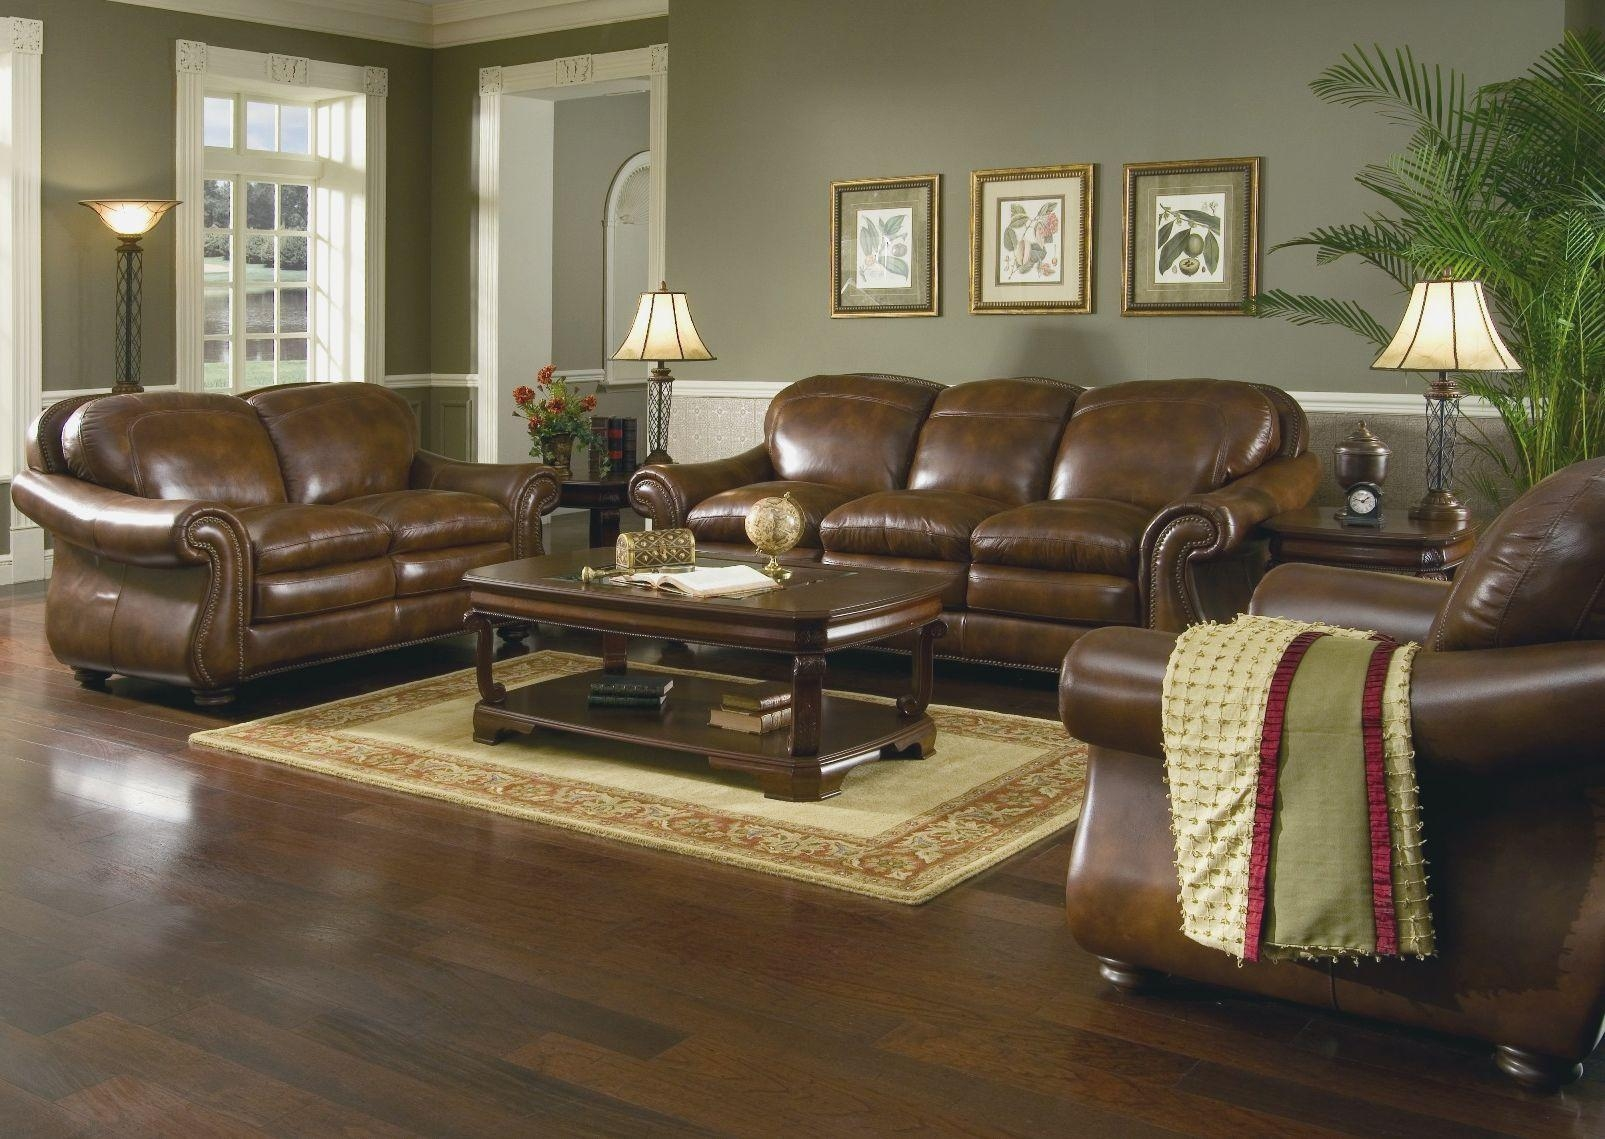 Interesting 90+ Chocolate Brown Sofa Living Room Ideas Decorating in Living Room With Brown Sofas